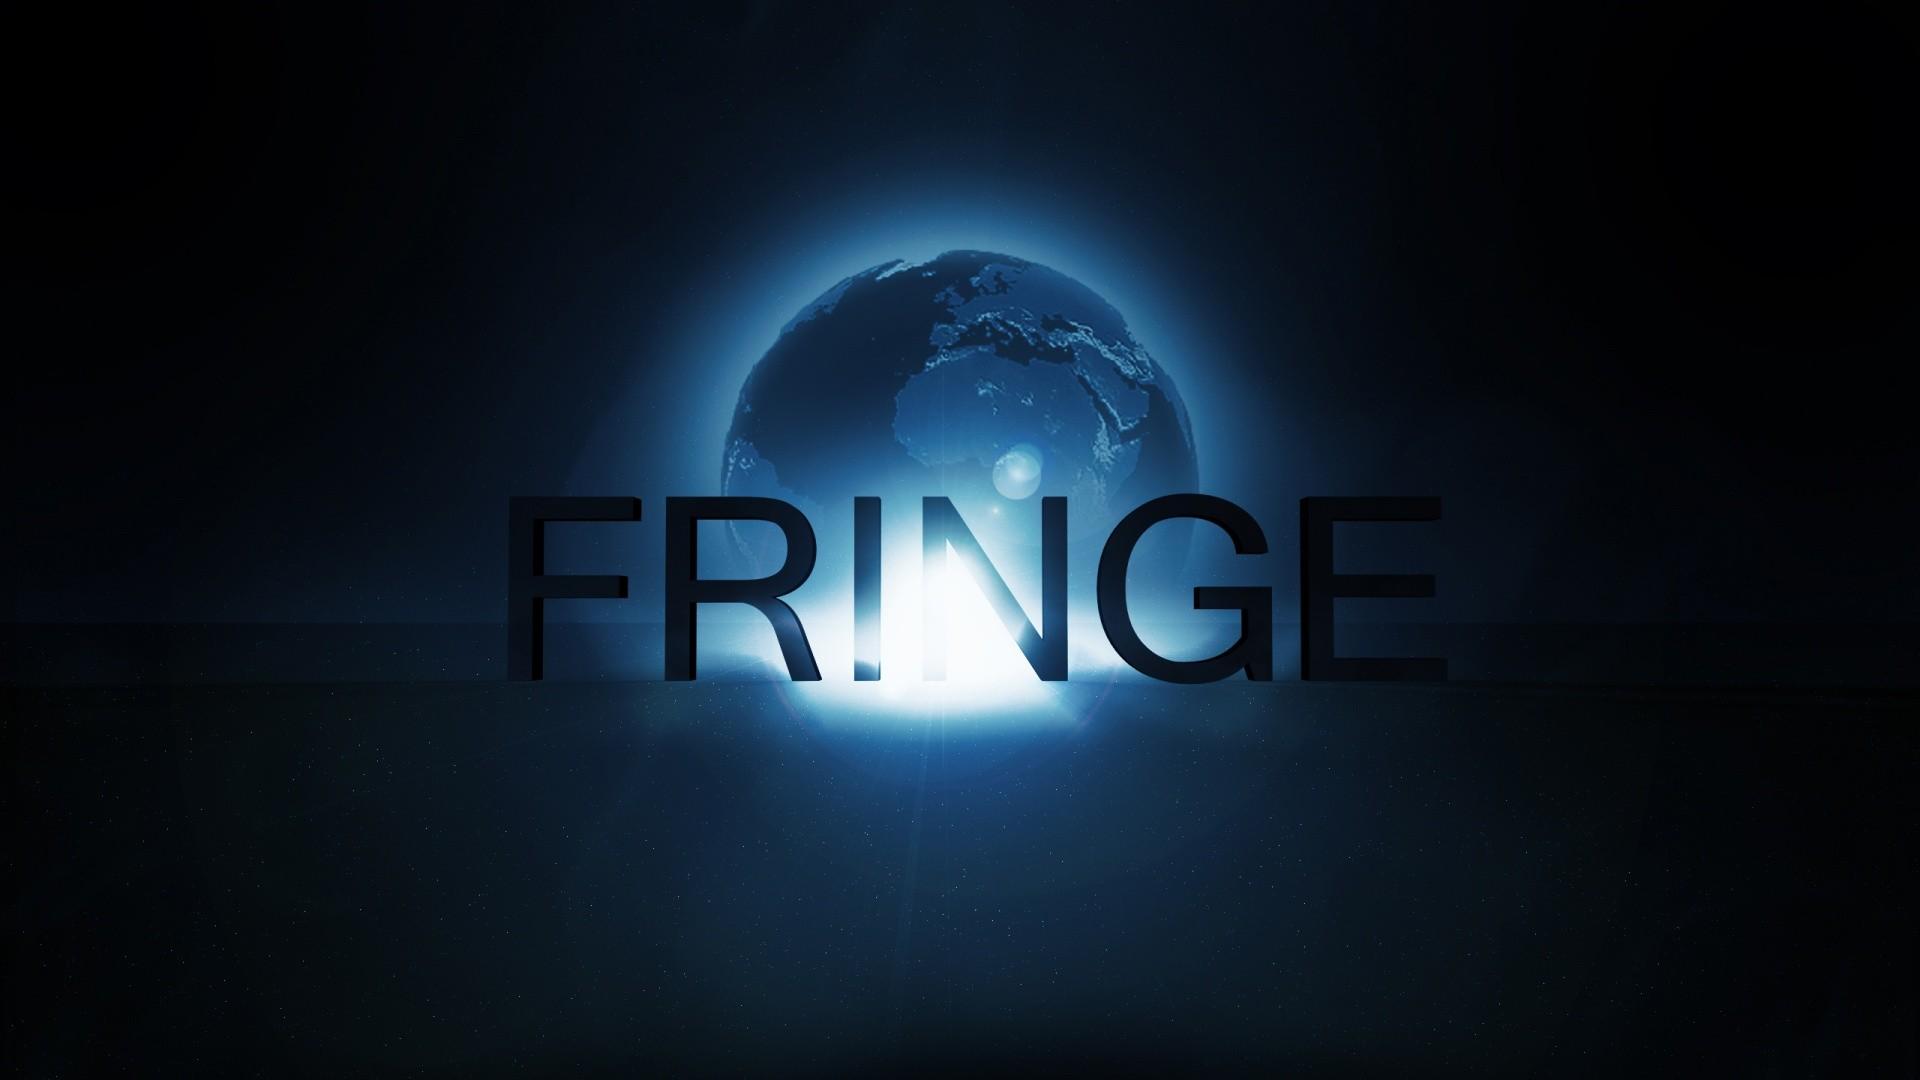 Fringe HD Wallpaper